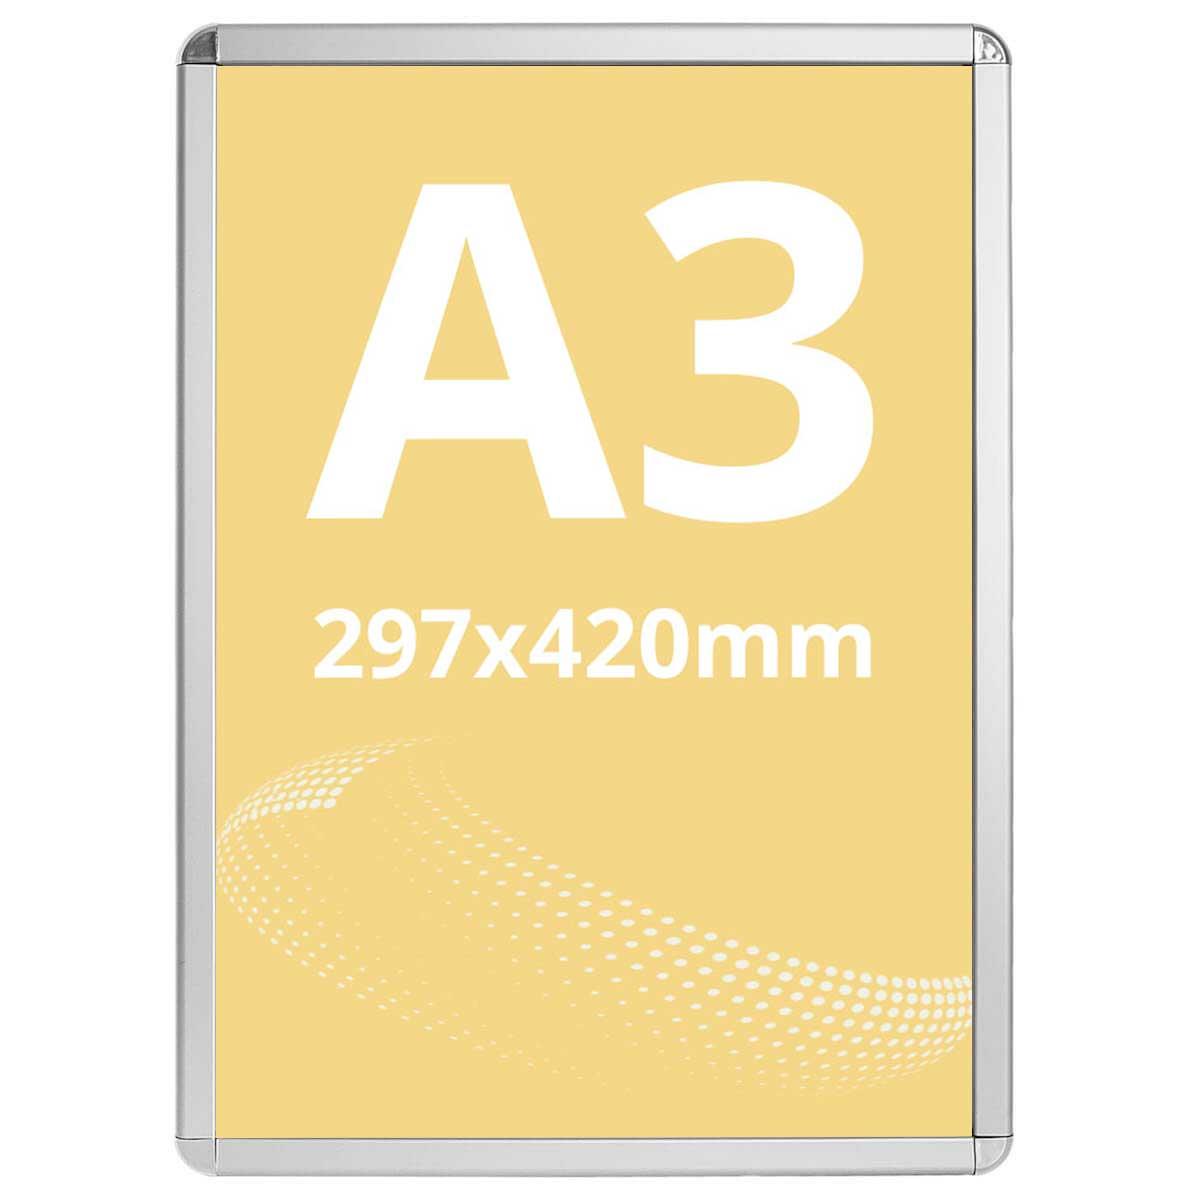 Ramă click Poster Frame din aluminiu 32, colțuri rotunde A3, JJ DISPLAYS, 297 x 420 mm